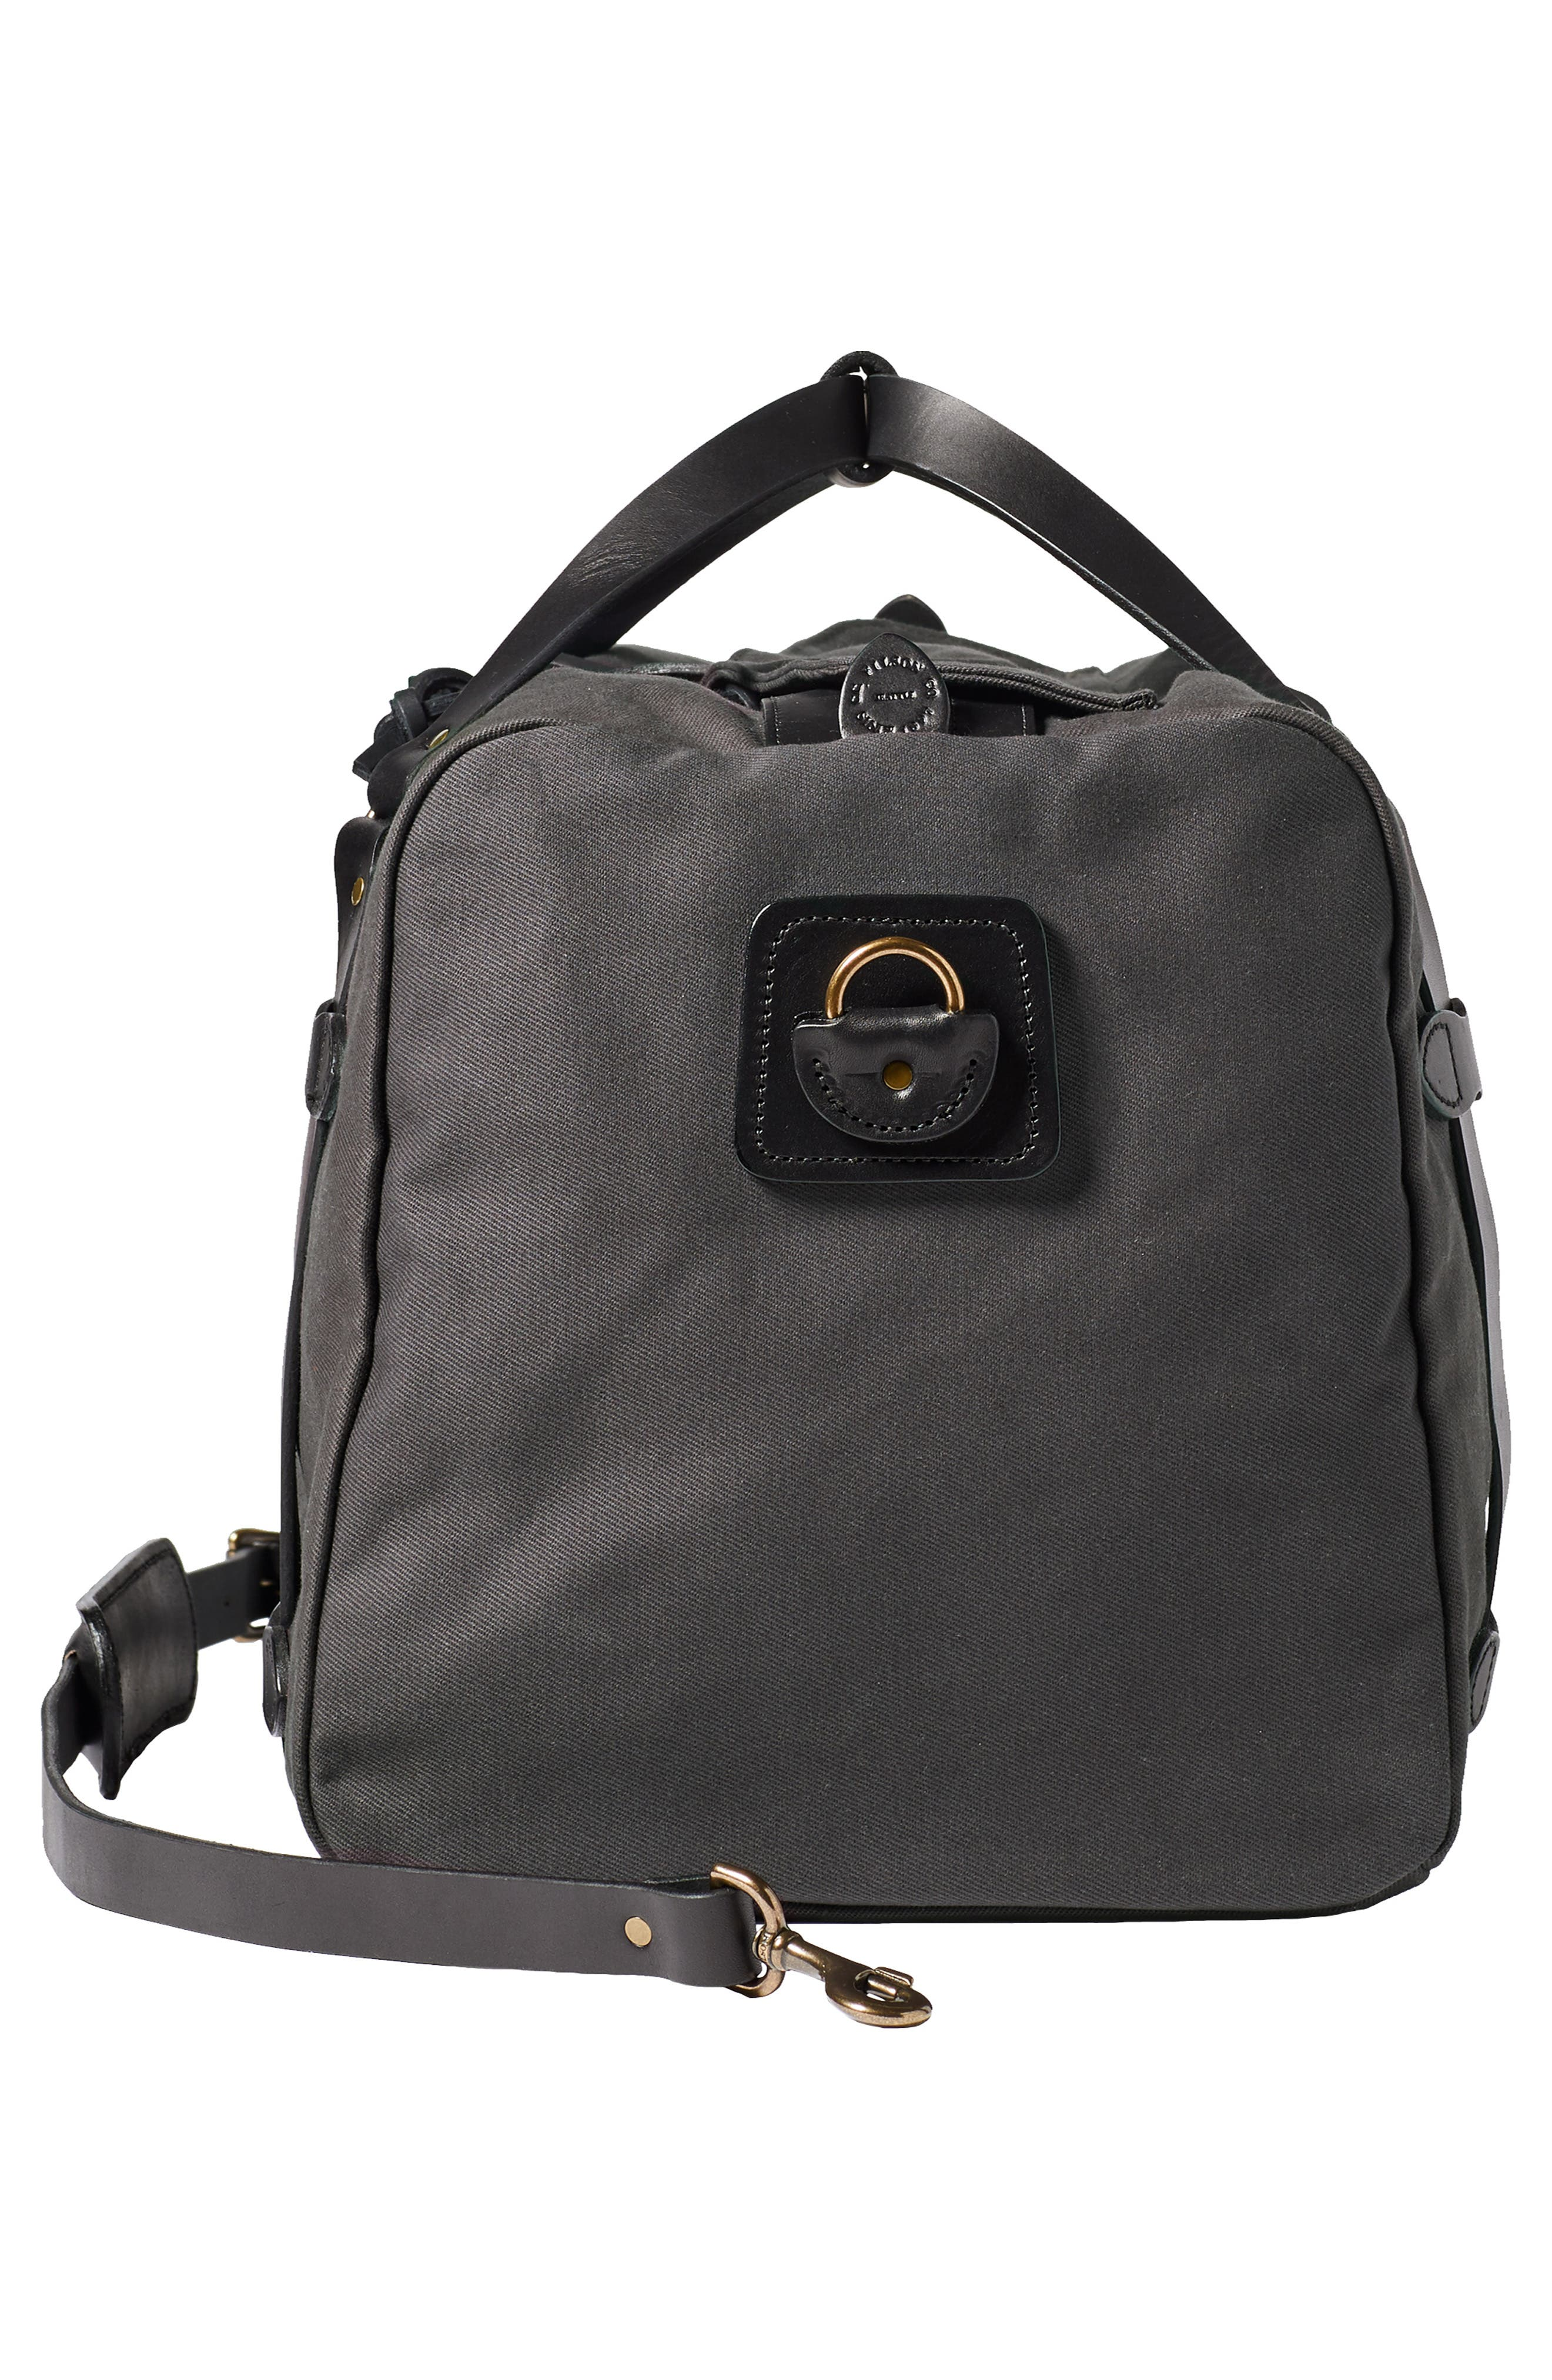 Medium Duffel Bag,                             Alternate thumbnail 4, color,                             CINDER